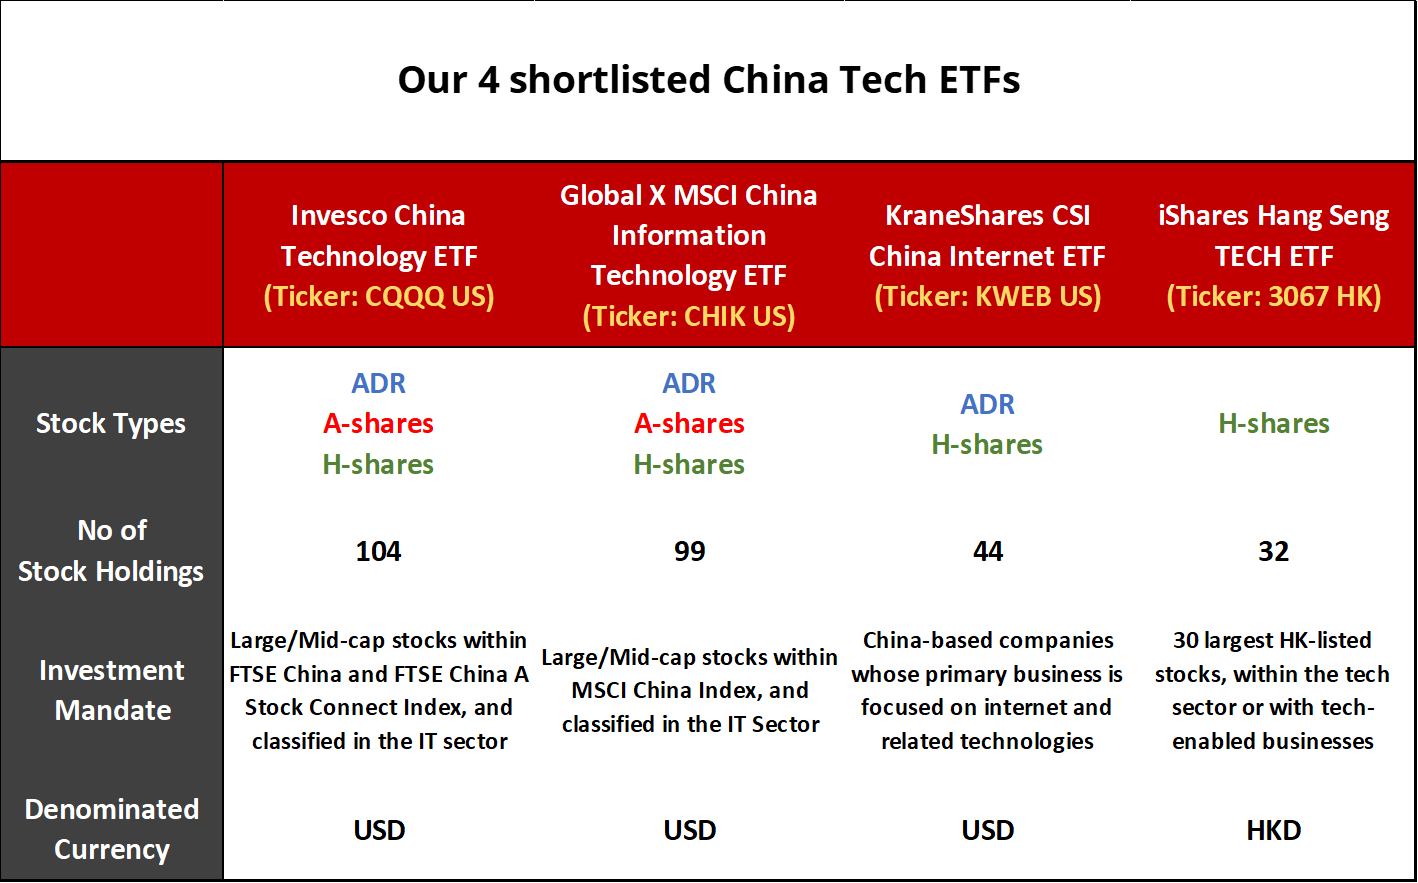 srcset=https://i1.wp.com/theinvestquest.com/wp-content/uploads/China-Tech-ETF-mandate.png?w=1418&ssl=1